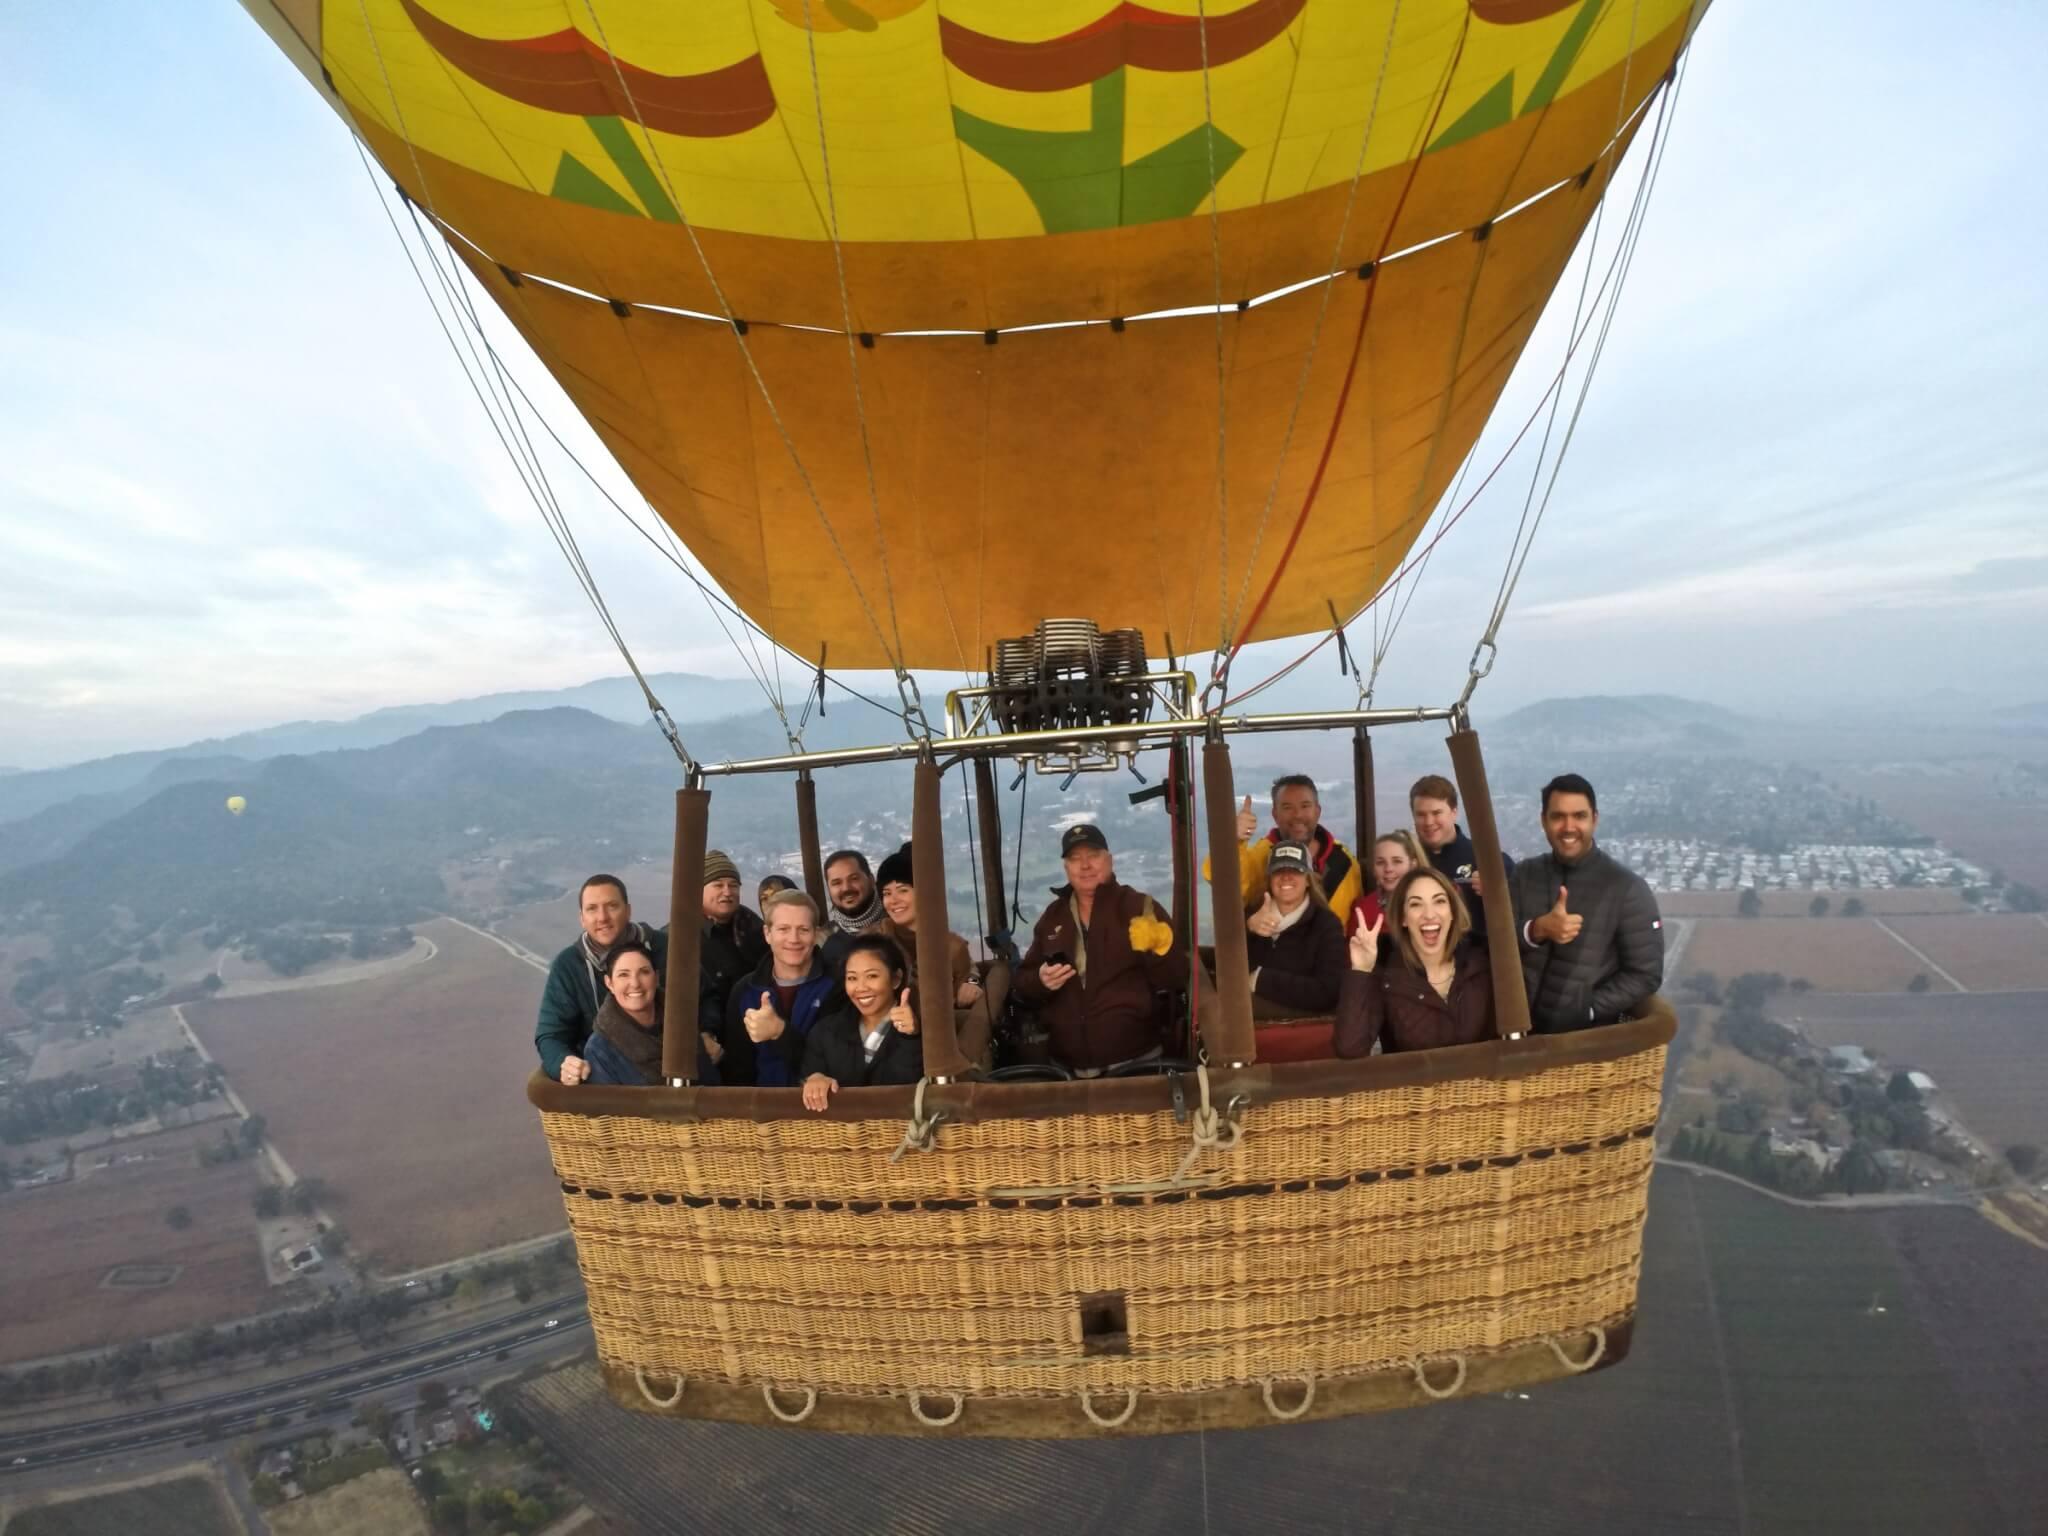 hot air balloon ride, hot air balloon, hot air balloon ride review, hot air baloon ride in napa, napa hot air balloon, things to do in napa